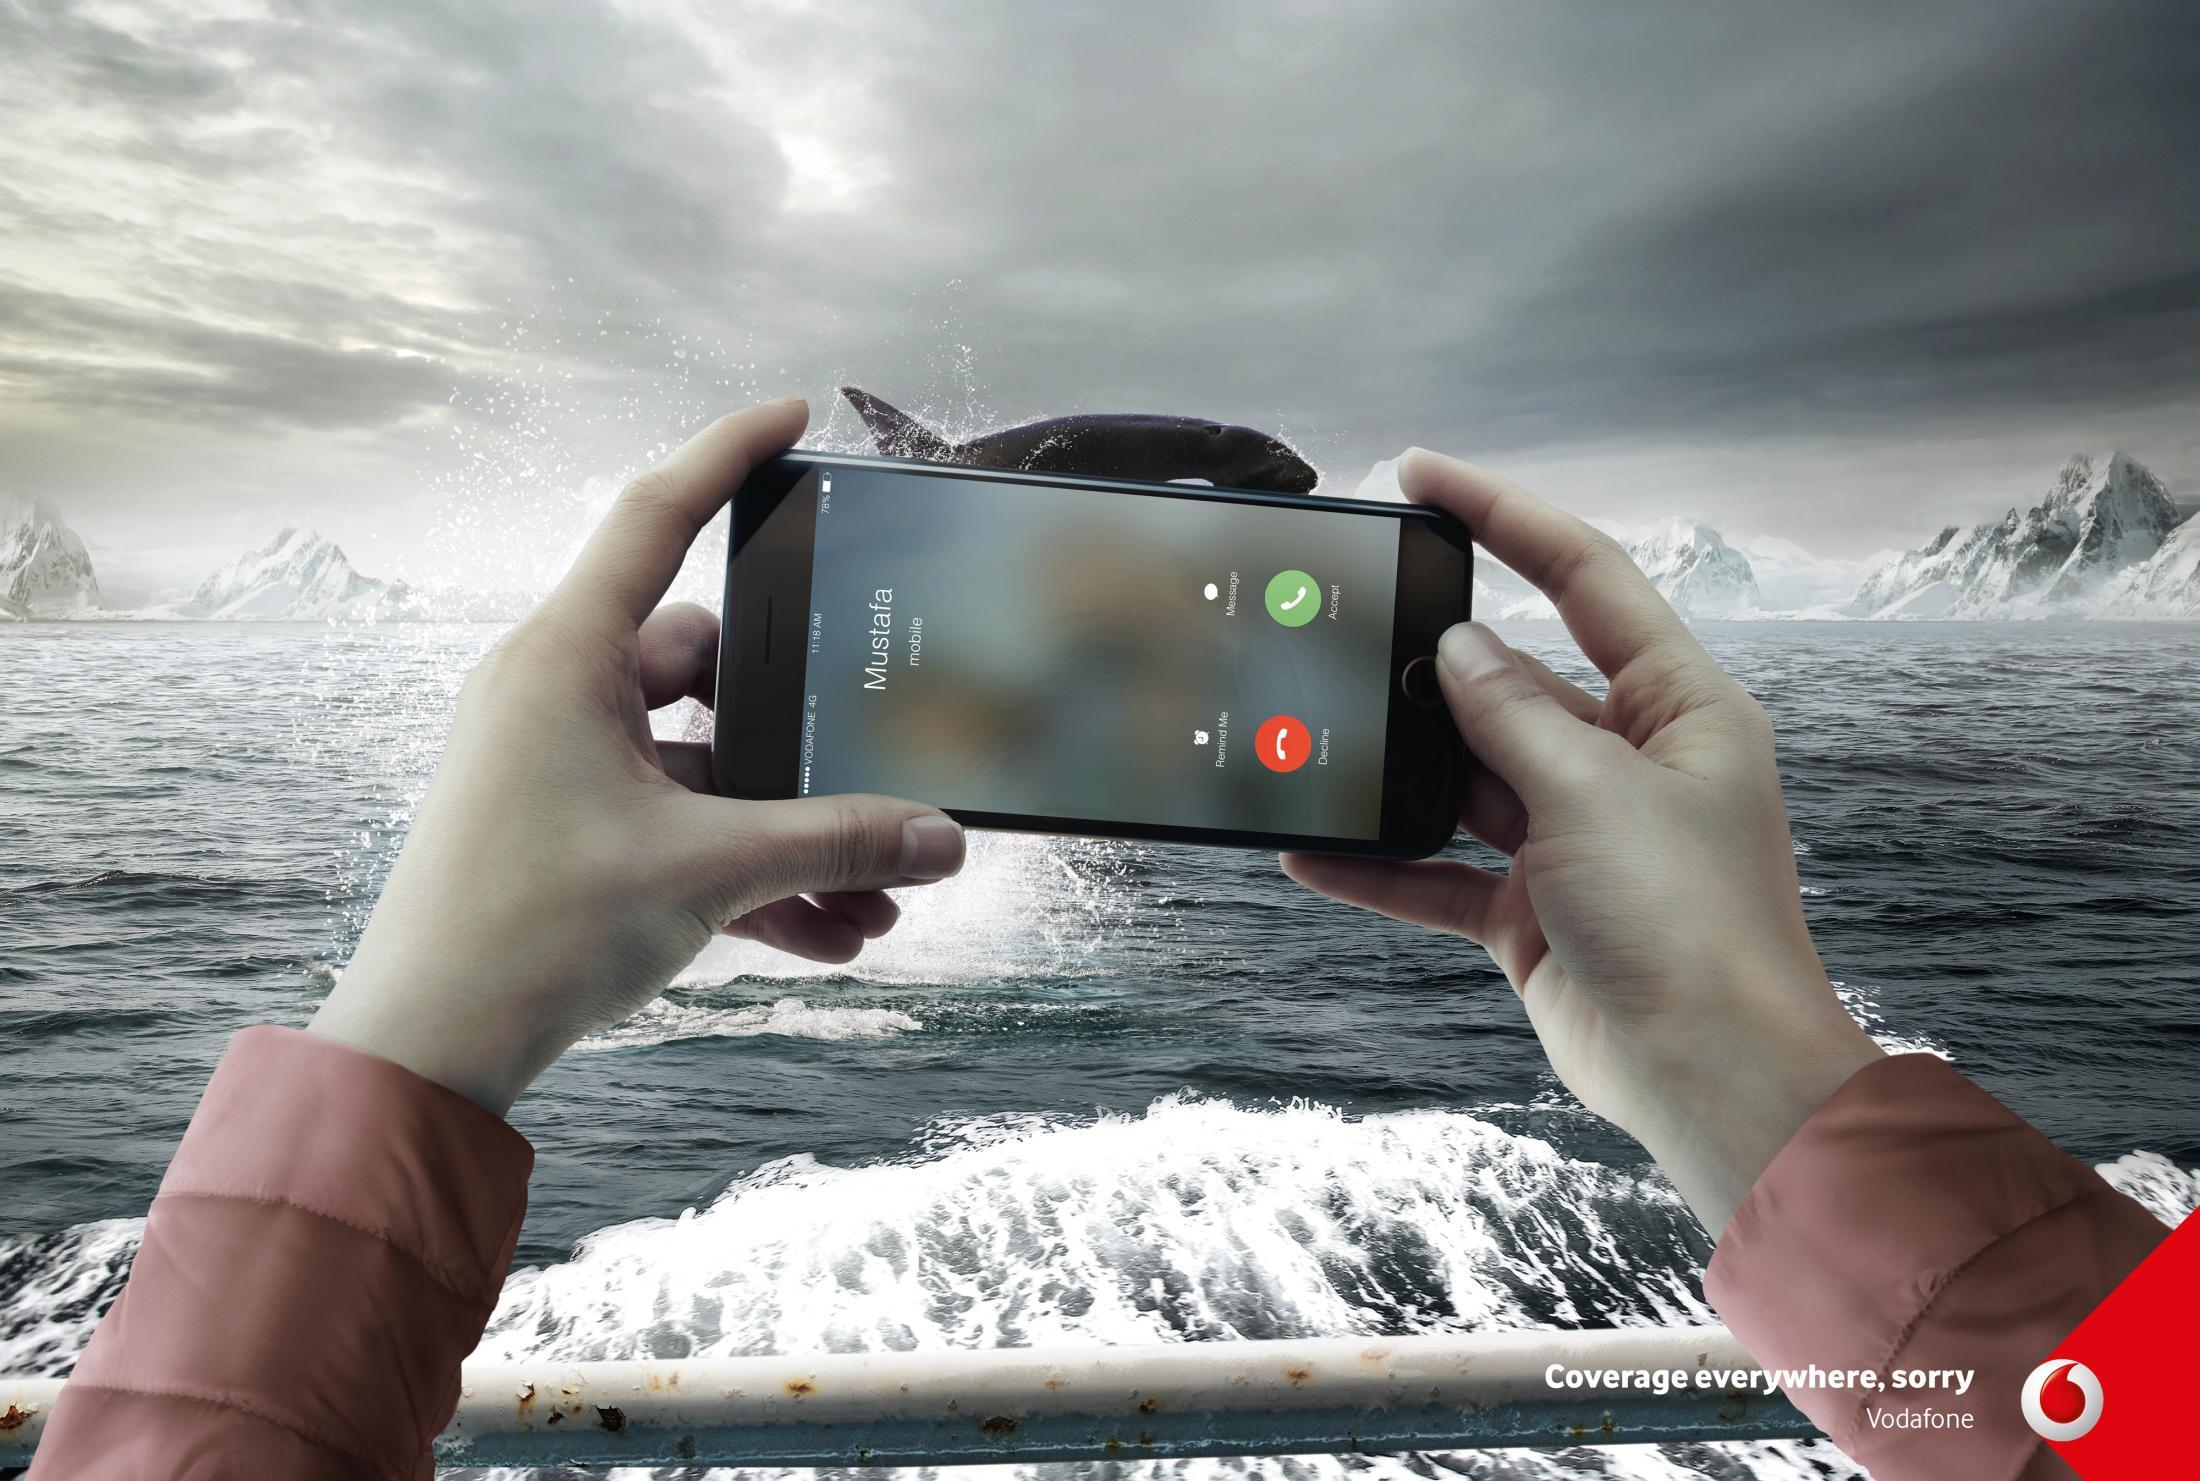 Vodafone Print Ad - Sorry / Whale, Print